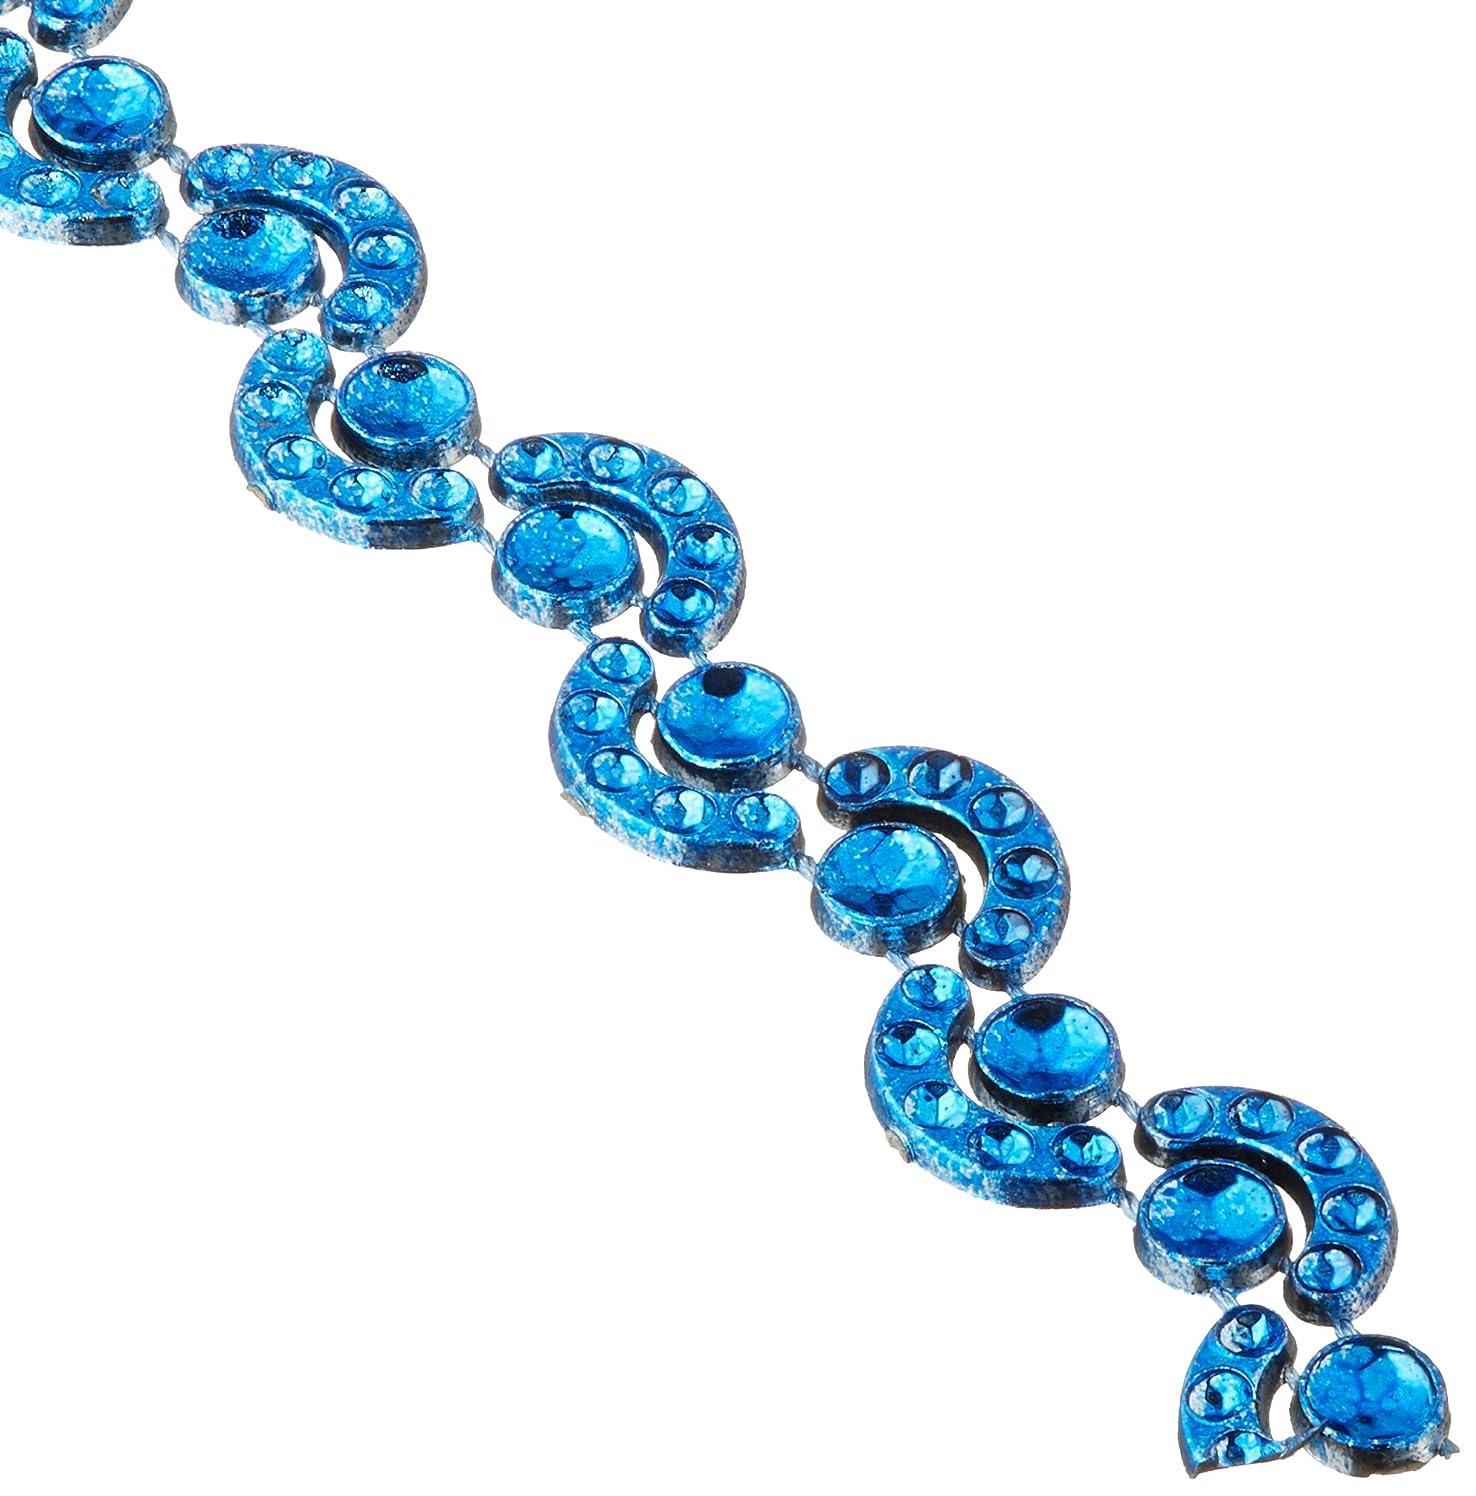 Homeford Firefly Imports Wave Rhinestone Trim Strand, 7mm, 10 Yards, Royal Blue